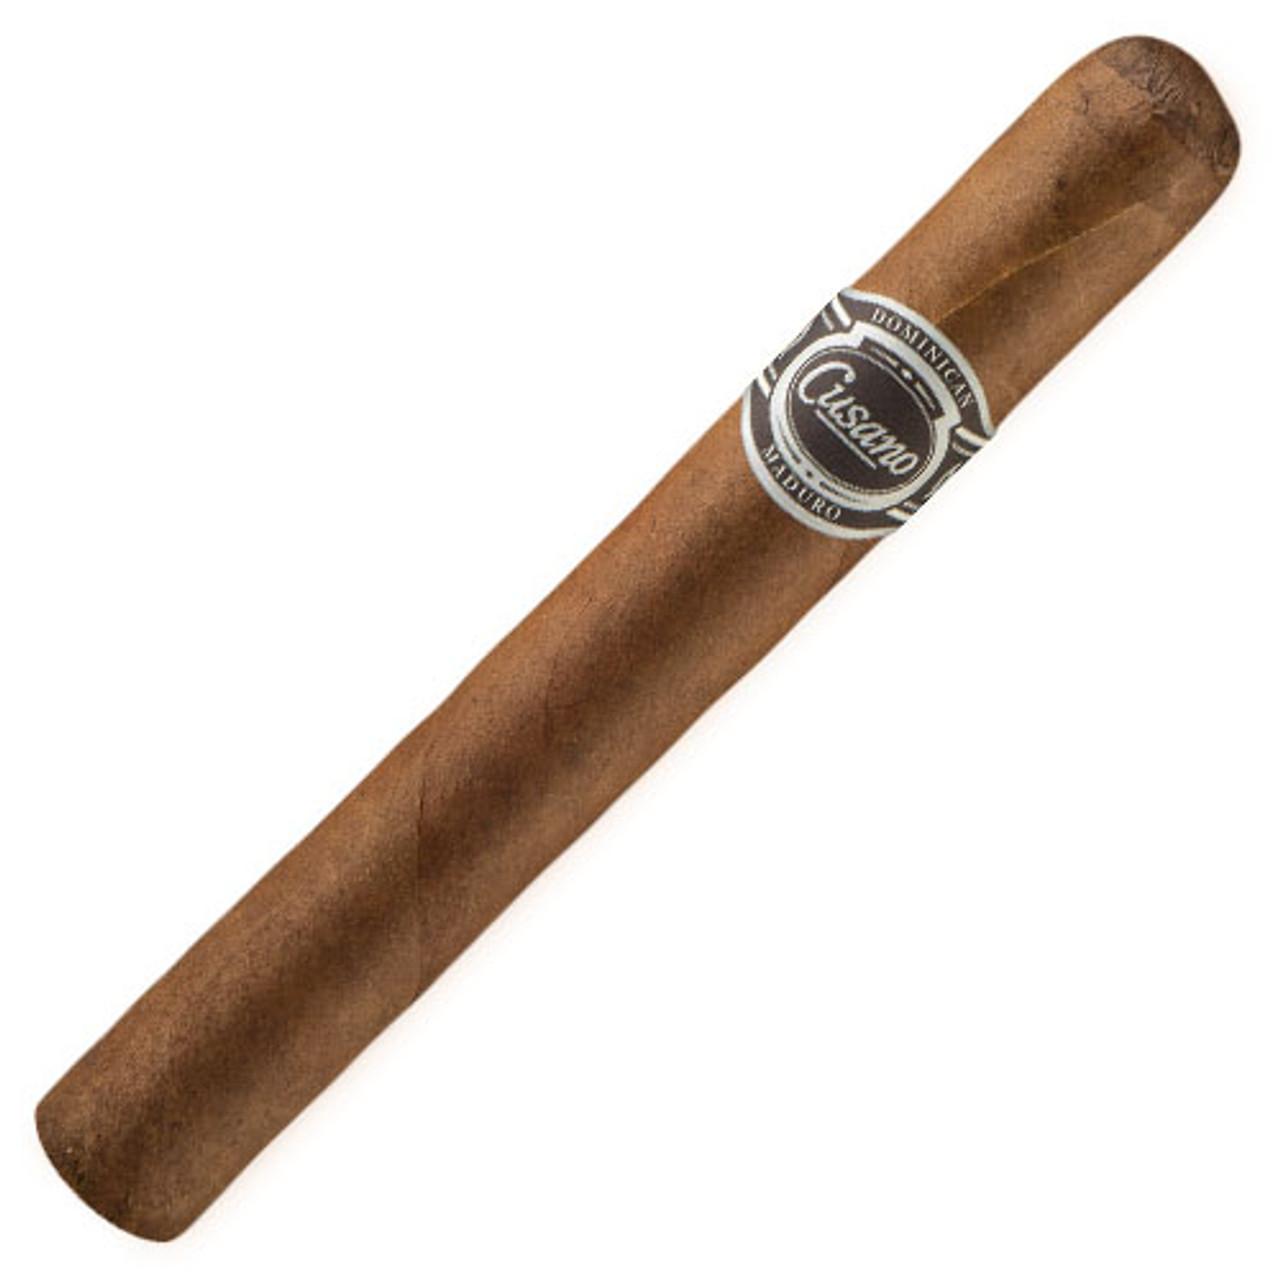 Cusano Maduro Toro CE Cigars - 6 x 50 (Box of 16)